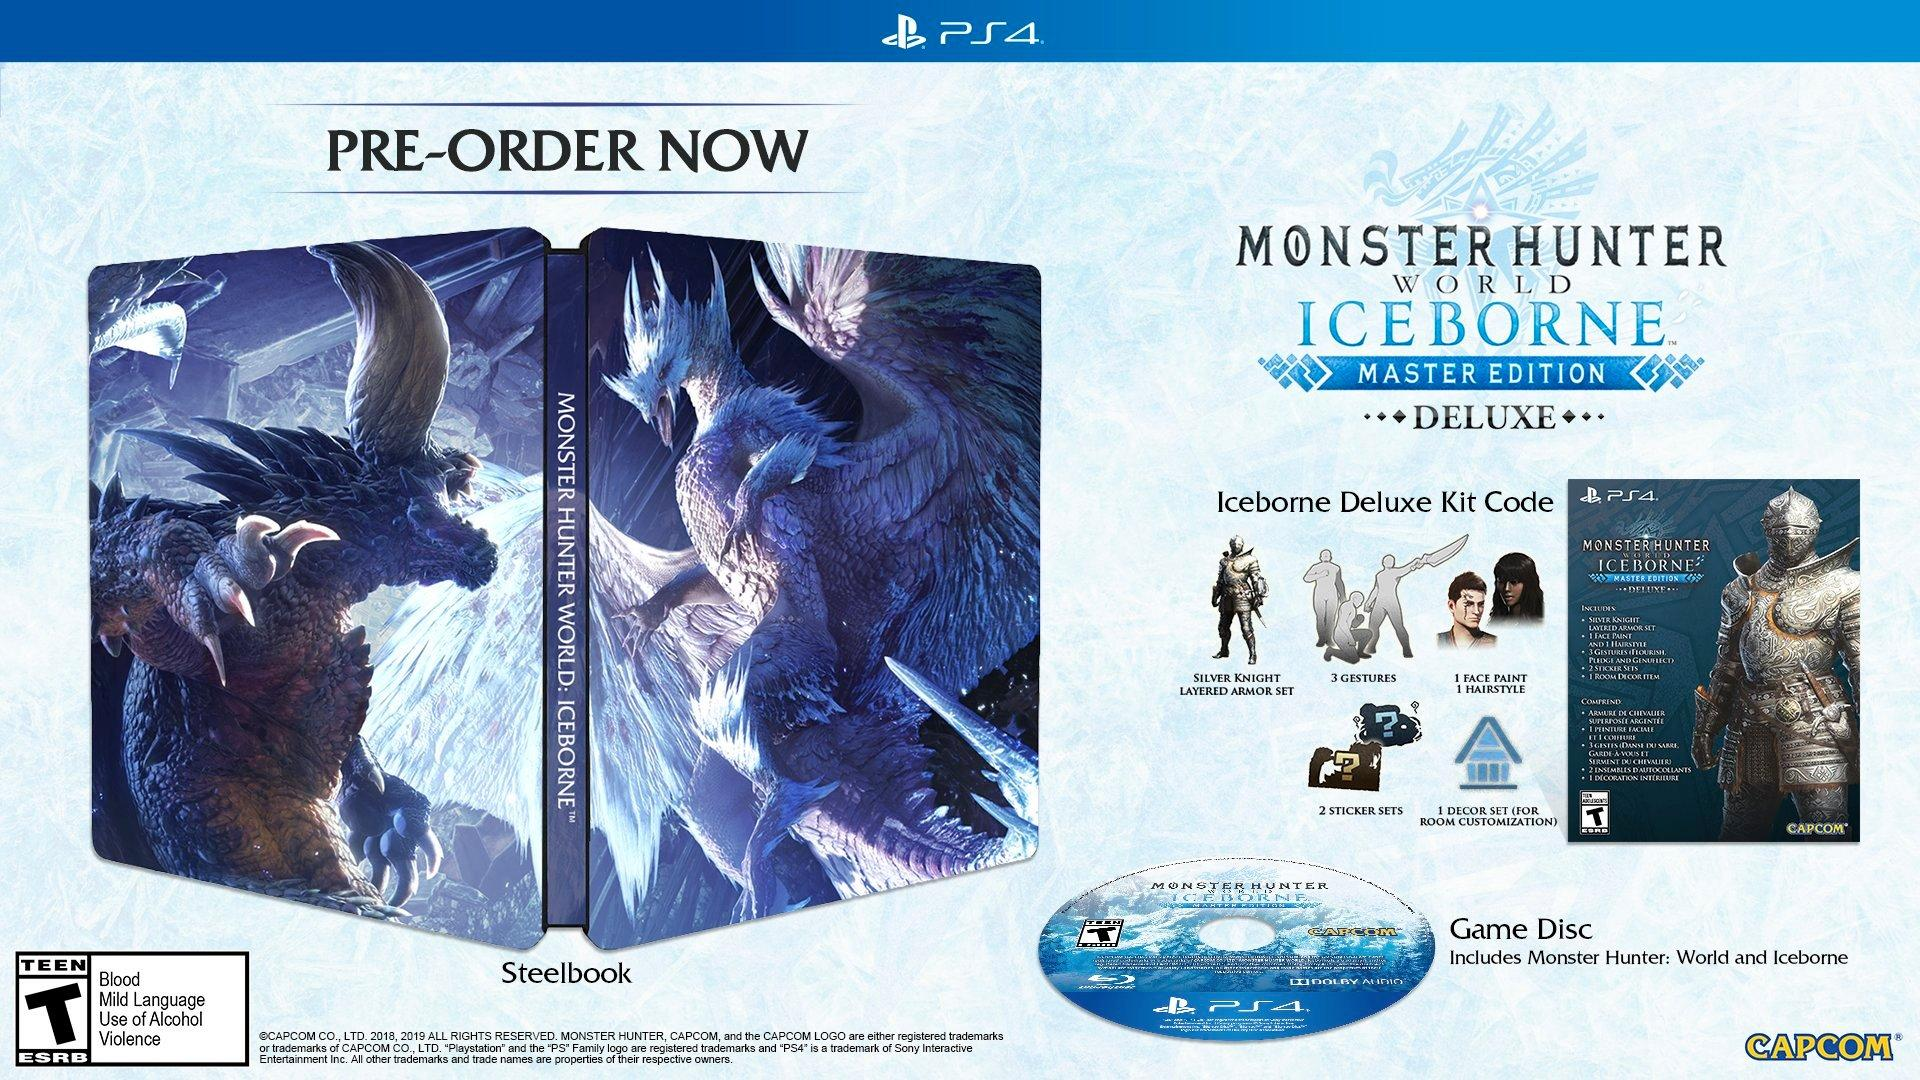 Monster Hunter: World Iceborne Master Edition Deluxe | PlayStation 4 |  GameStop